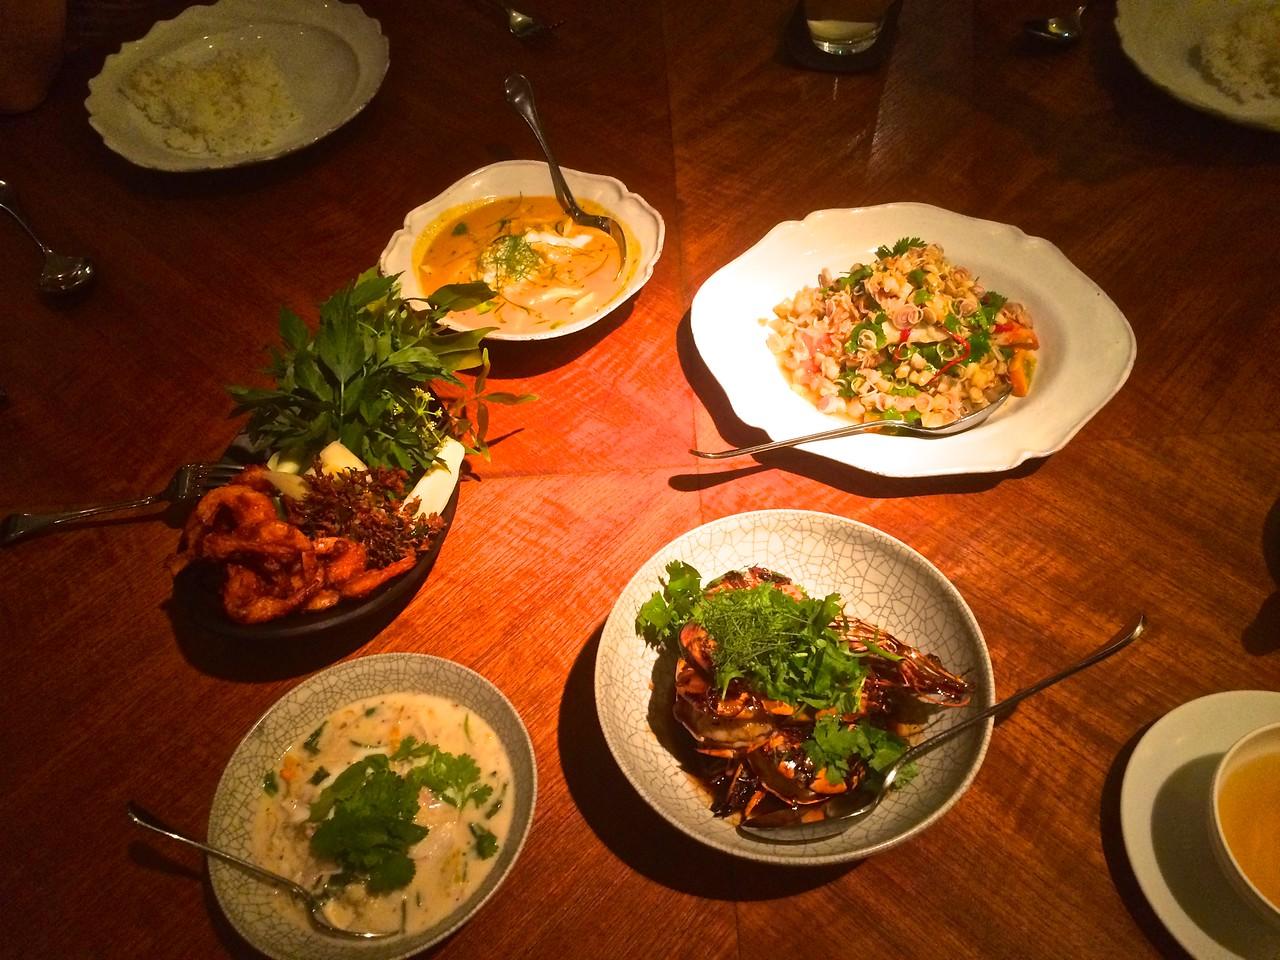 A 'humble' family style Thai dinner!